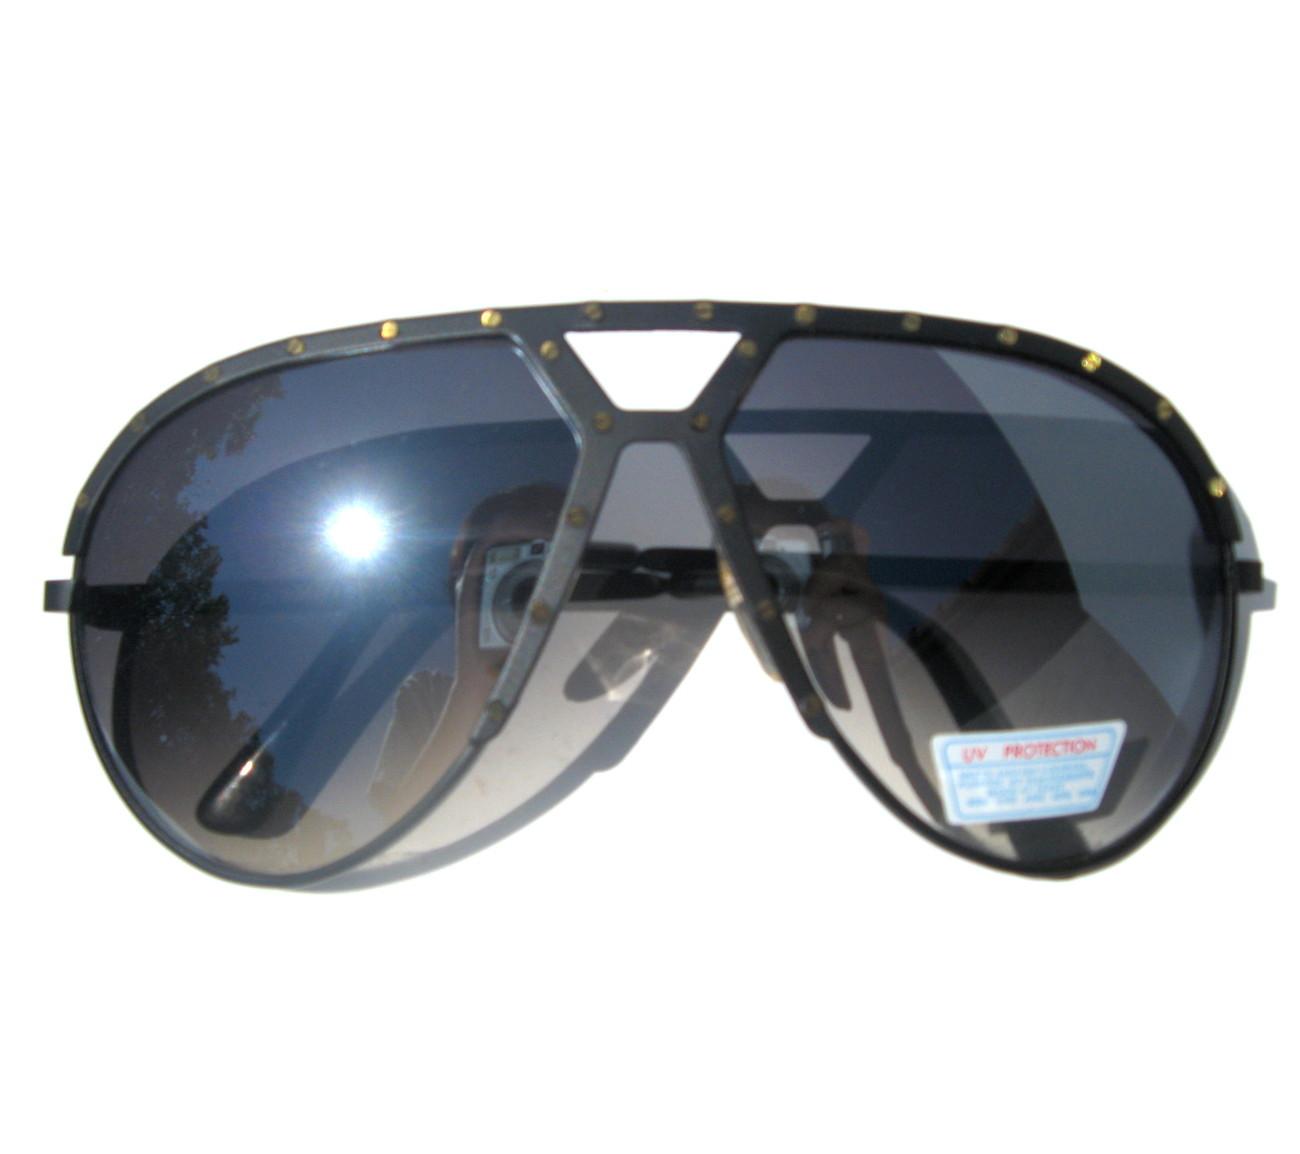 Black Studded Vintage Jay Z Hip Hop Aviator Sunglasses (Similar to Alpina M1)